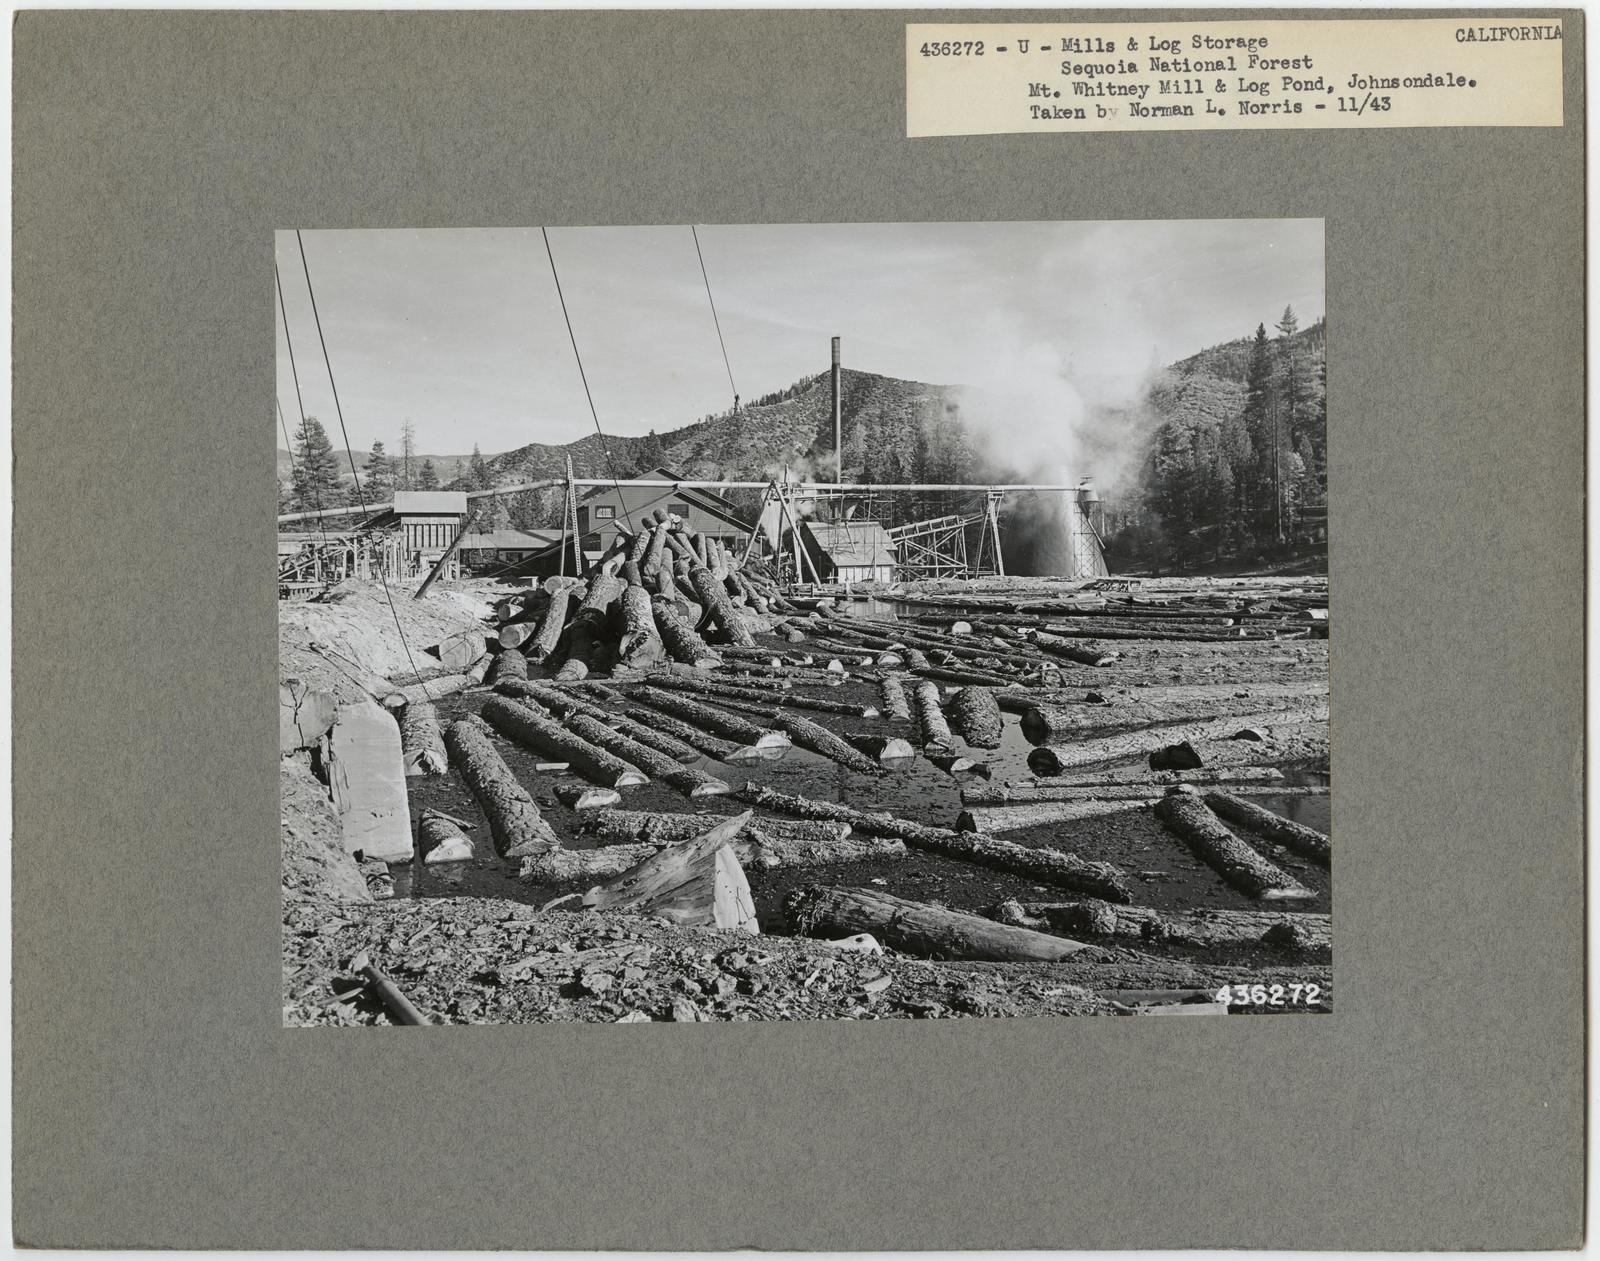 Mills, Milling and Log Storage - California